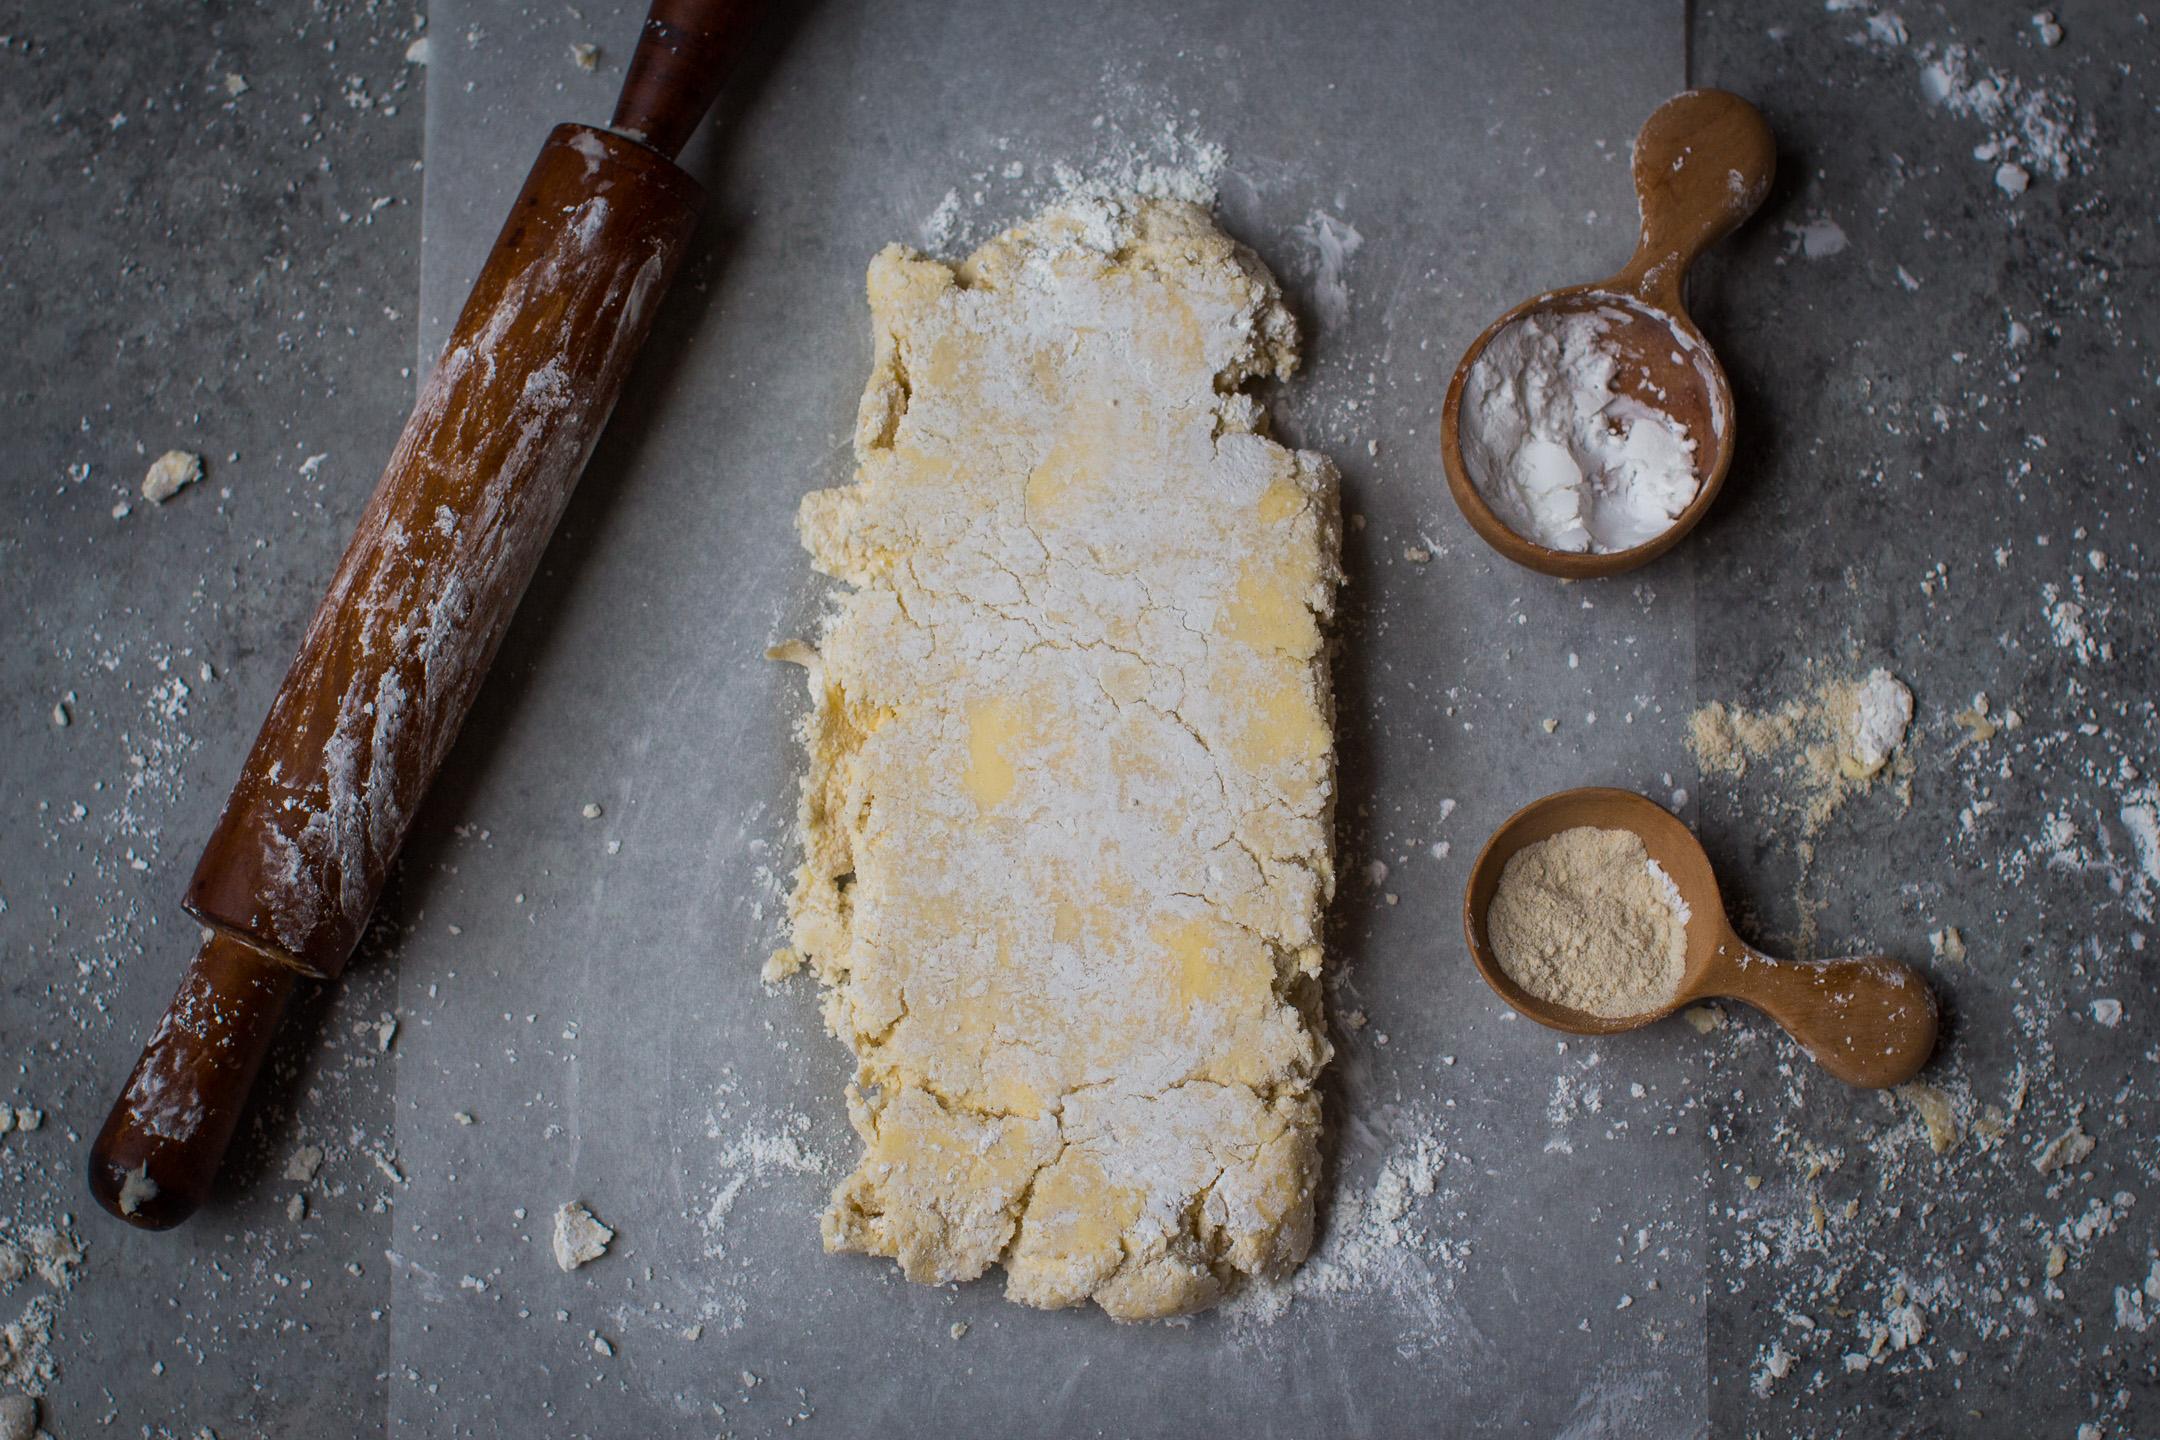 rough-puff-pastry-gluten-free-recipe-1